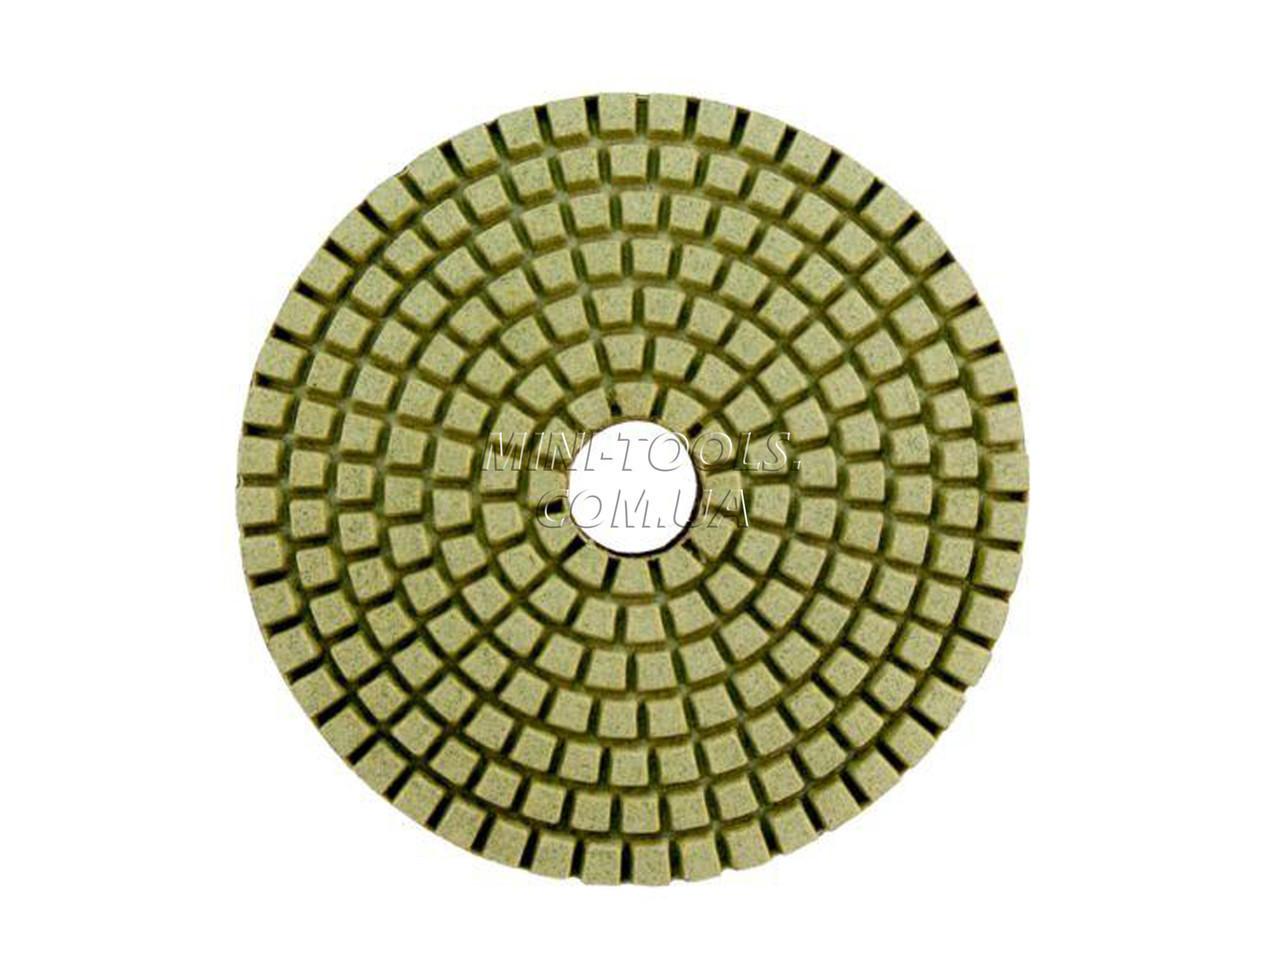 Черепашка D-125мм. зерно #200. Алмазний гнучкий шліфувальний круг YDS Tools